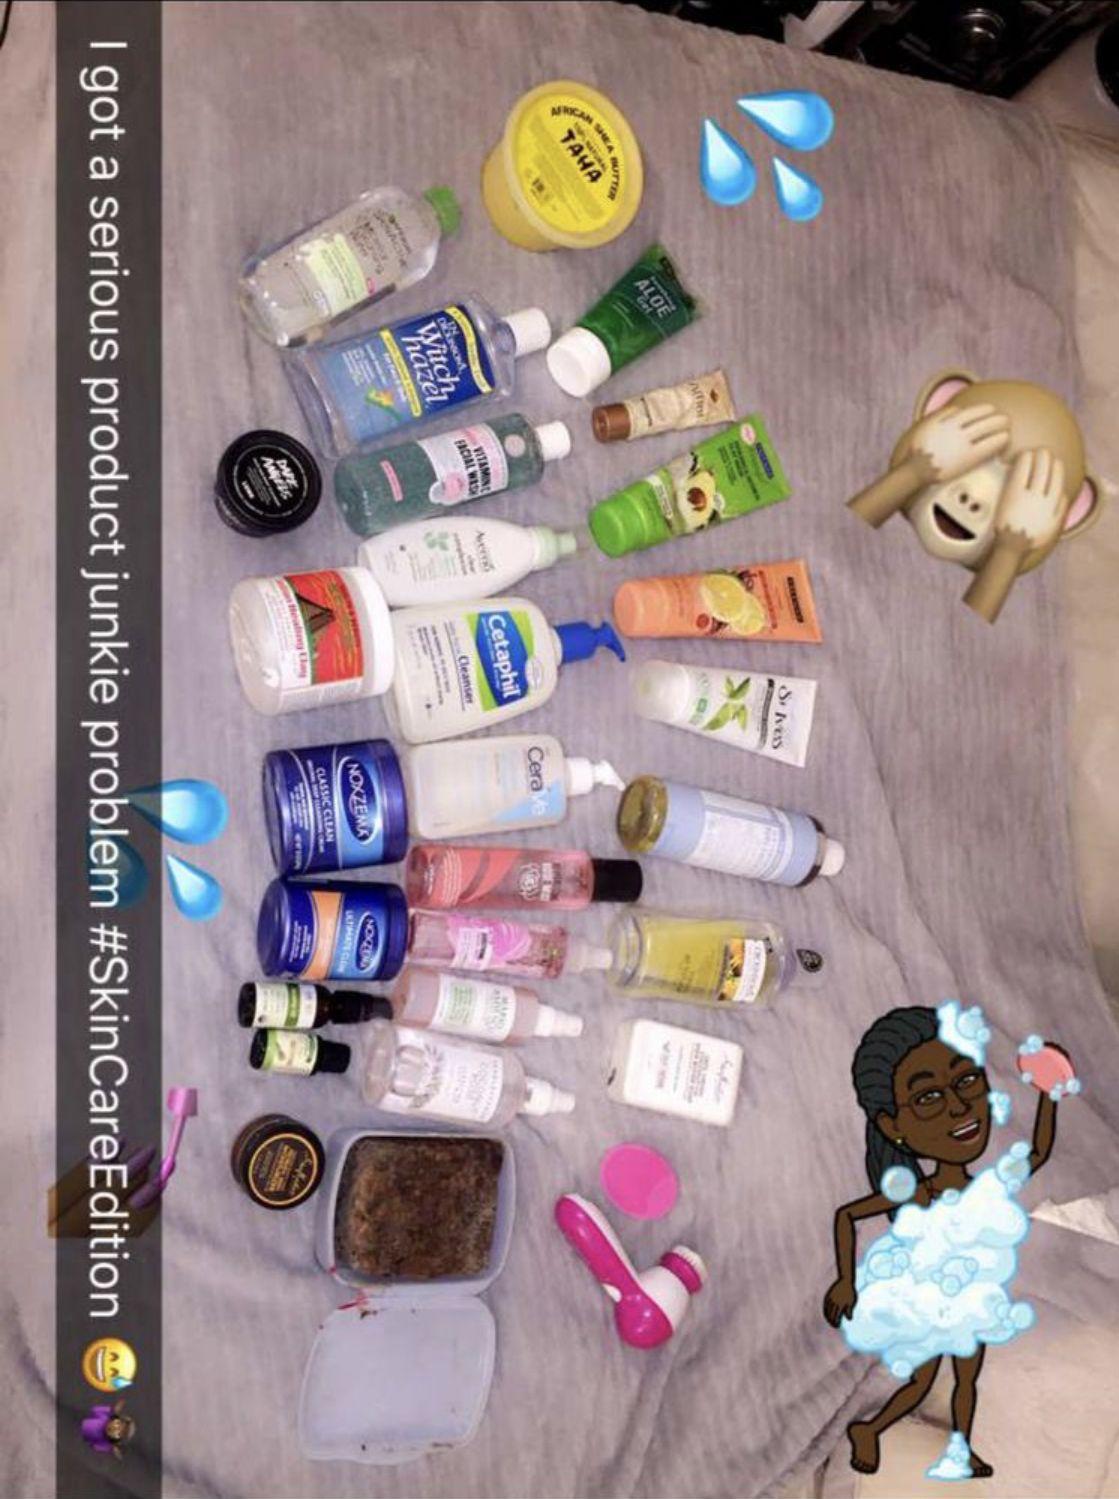 Follow me isthatbrooklynn skin care routine beauty